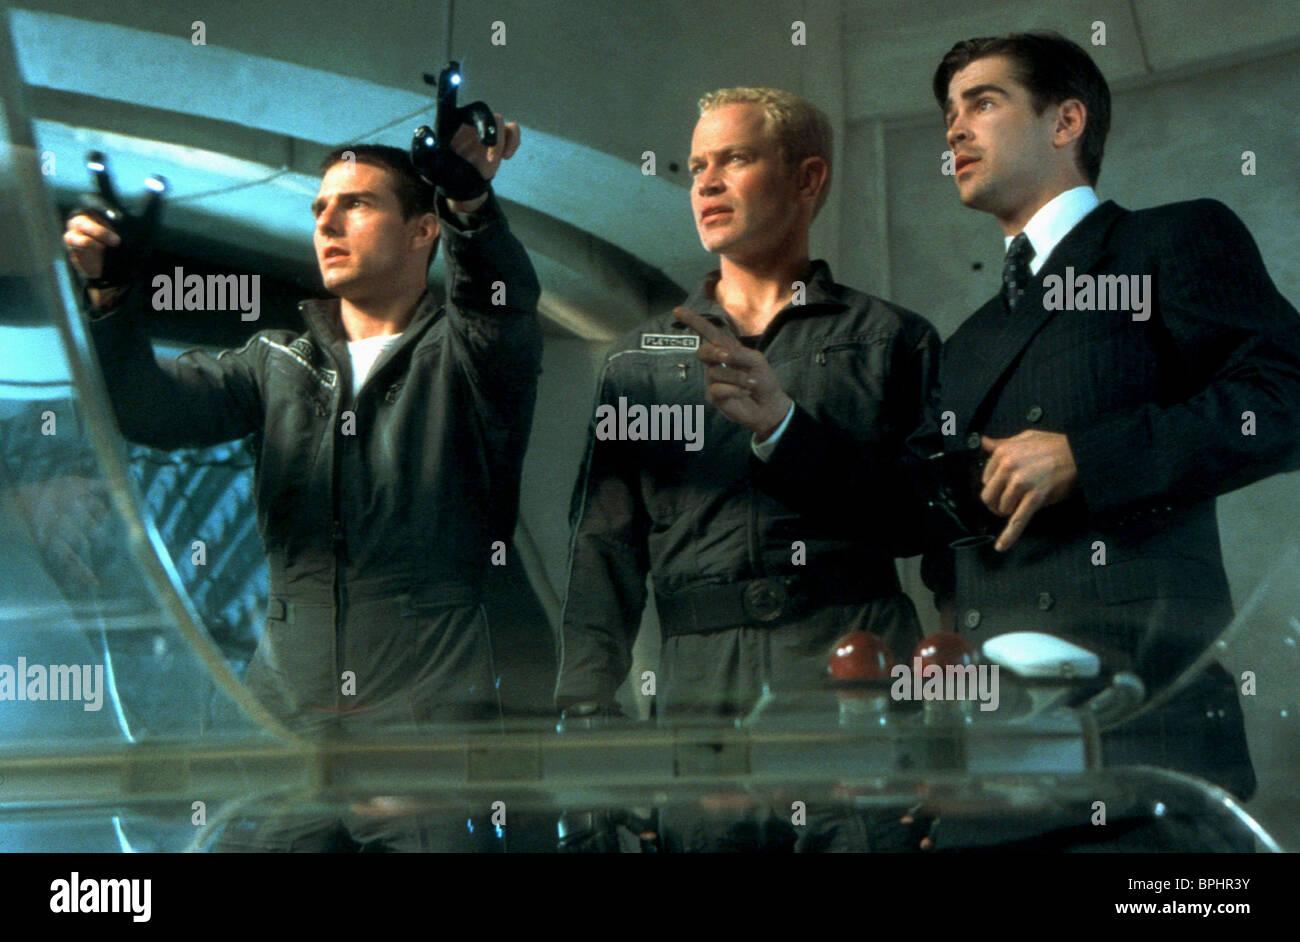 Tom Cruise Neal Mcdonough Colin Farrell Minority Report 2002 Stock Photo Alamy